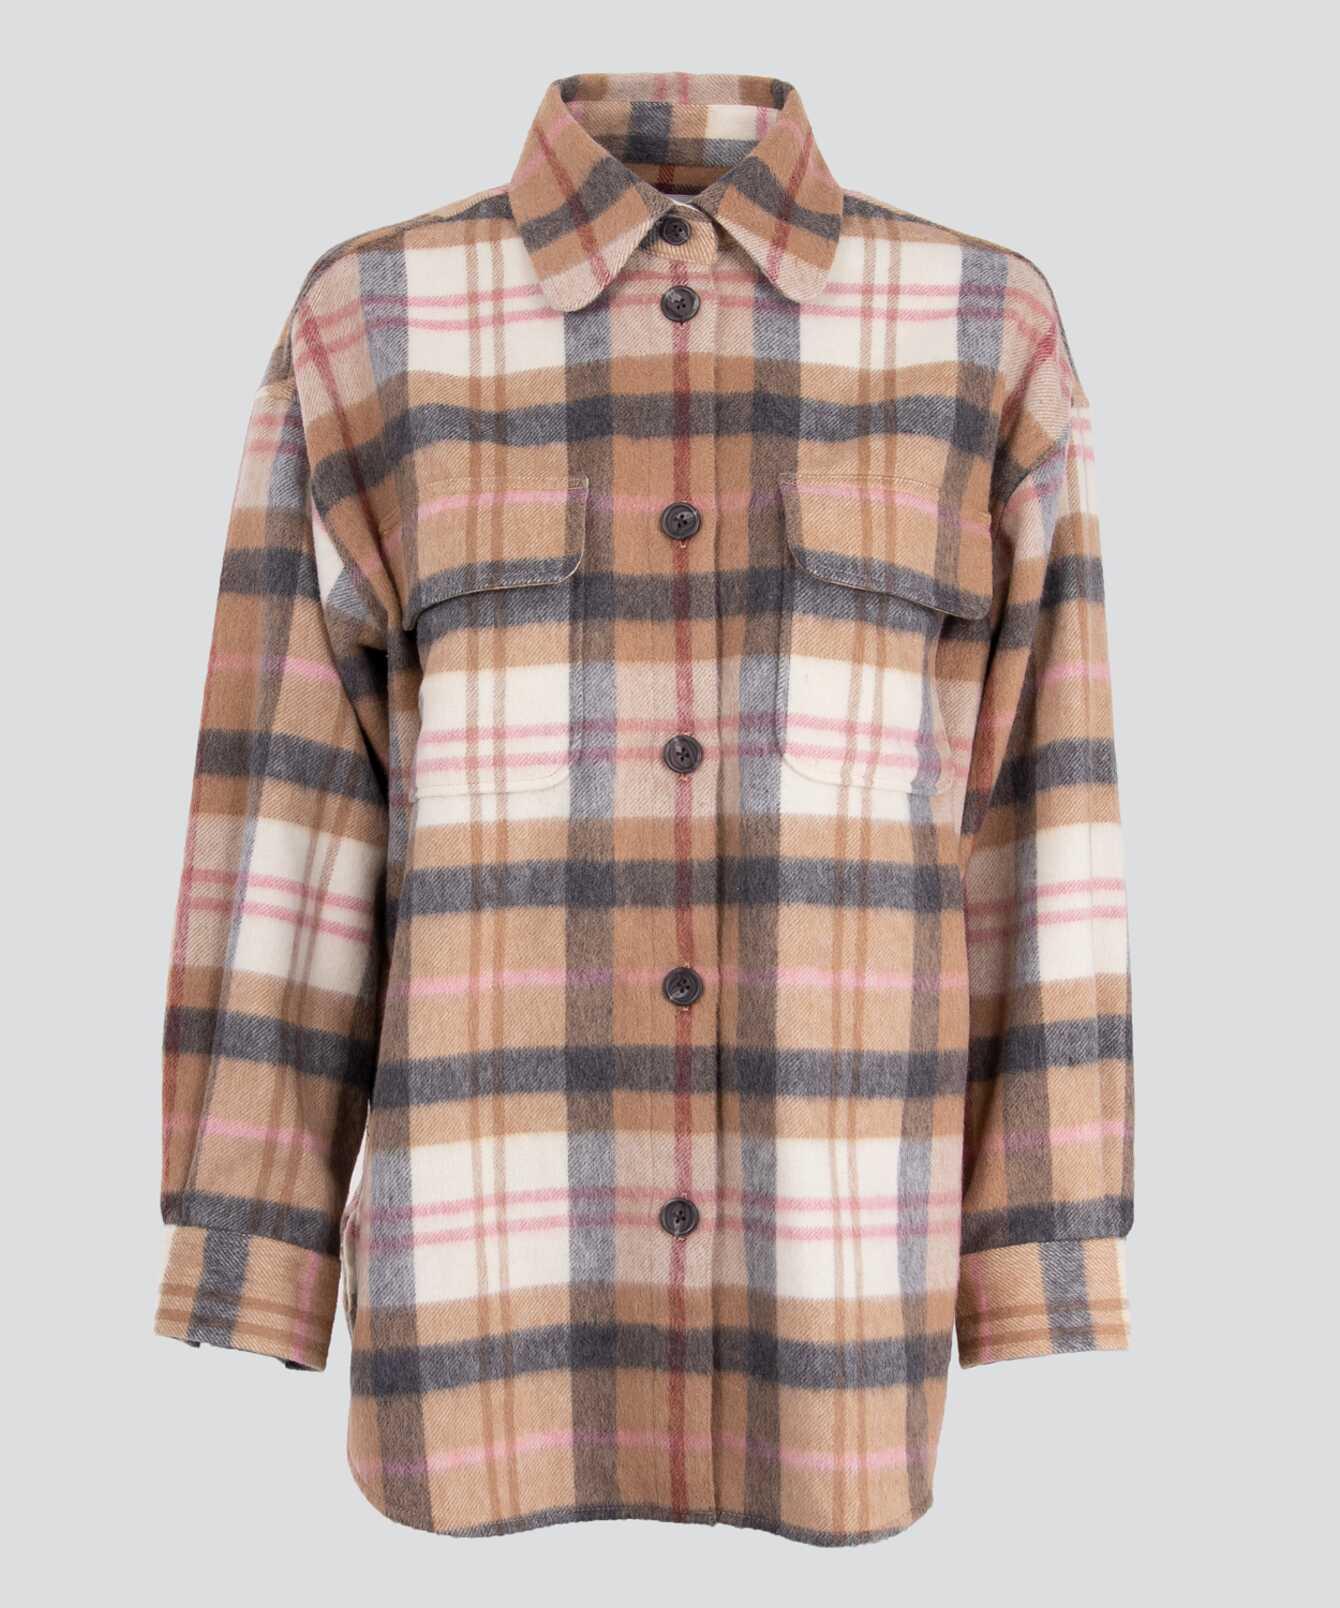 Skjorta Holly Plaid Overshirt The Shirt Factory